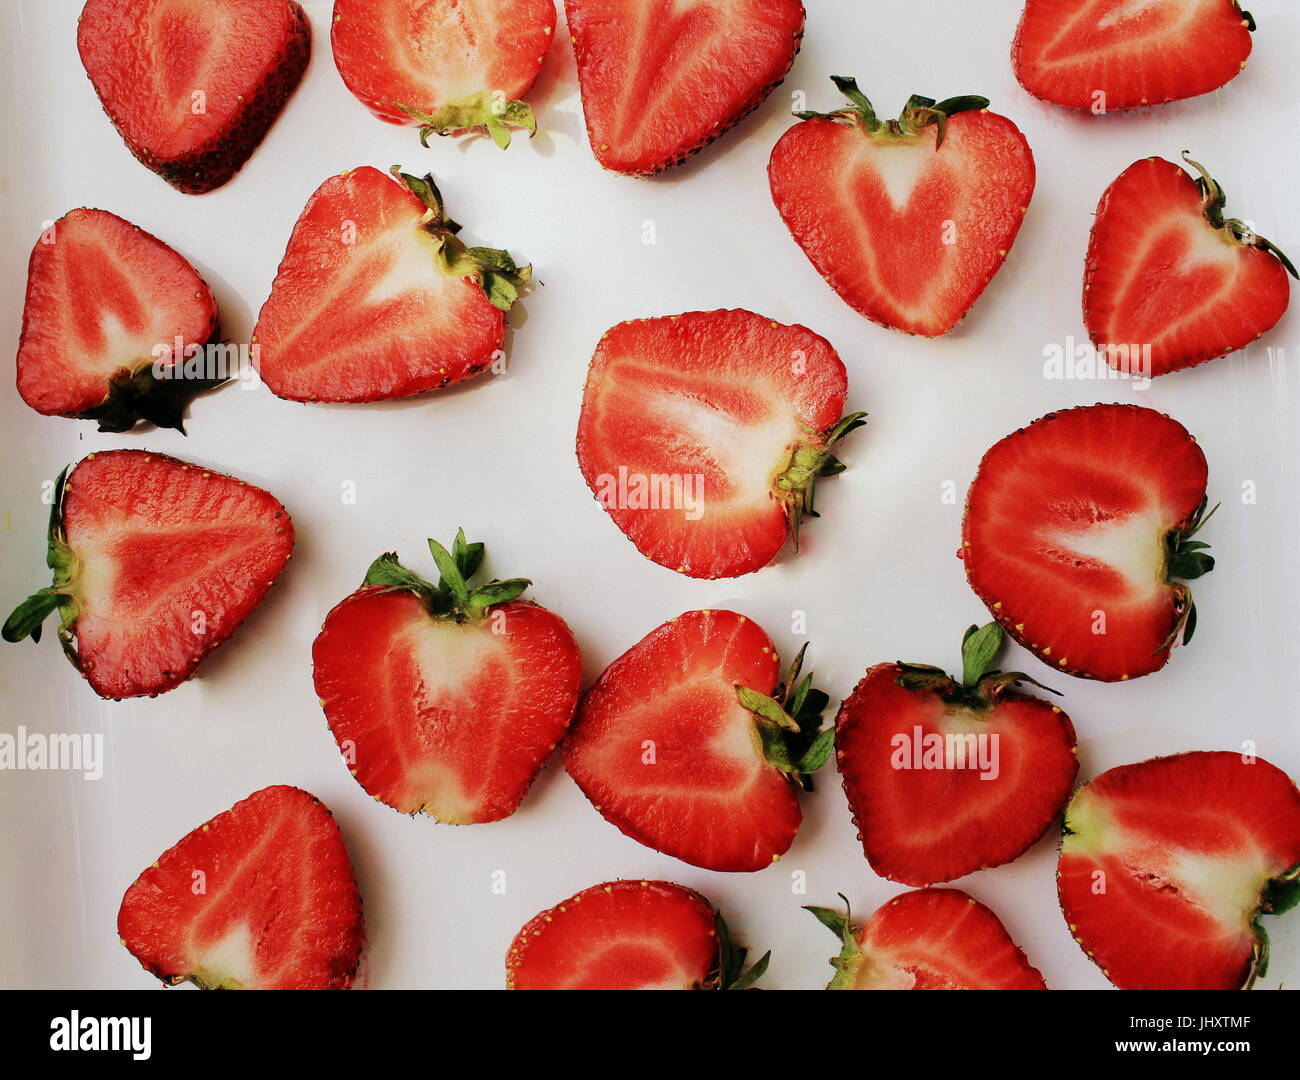 Fresa patrón creativo. Alimentos aislados como telón de fondo. Rodajas de bayas rojas maduras con hojas Imagen De Stock